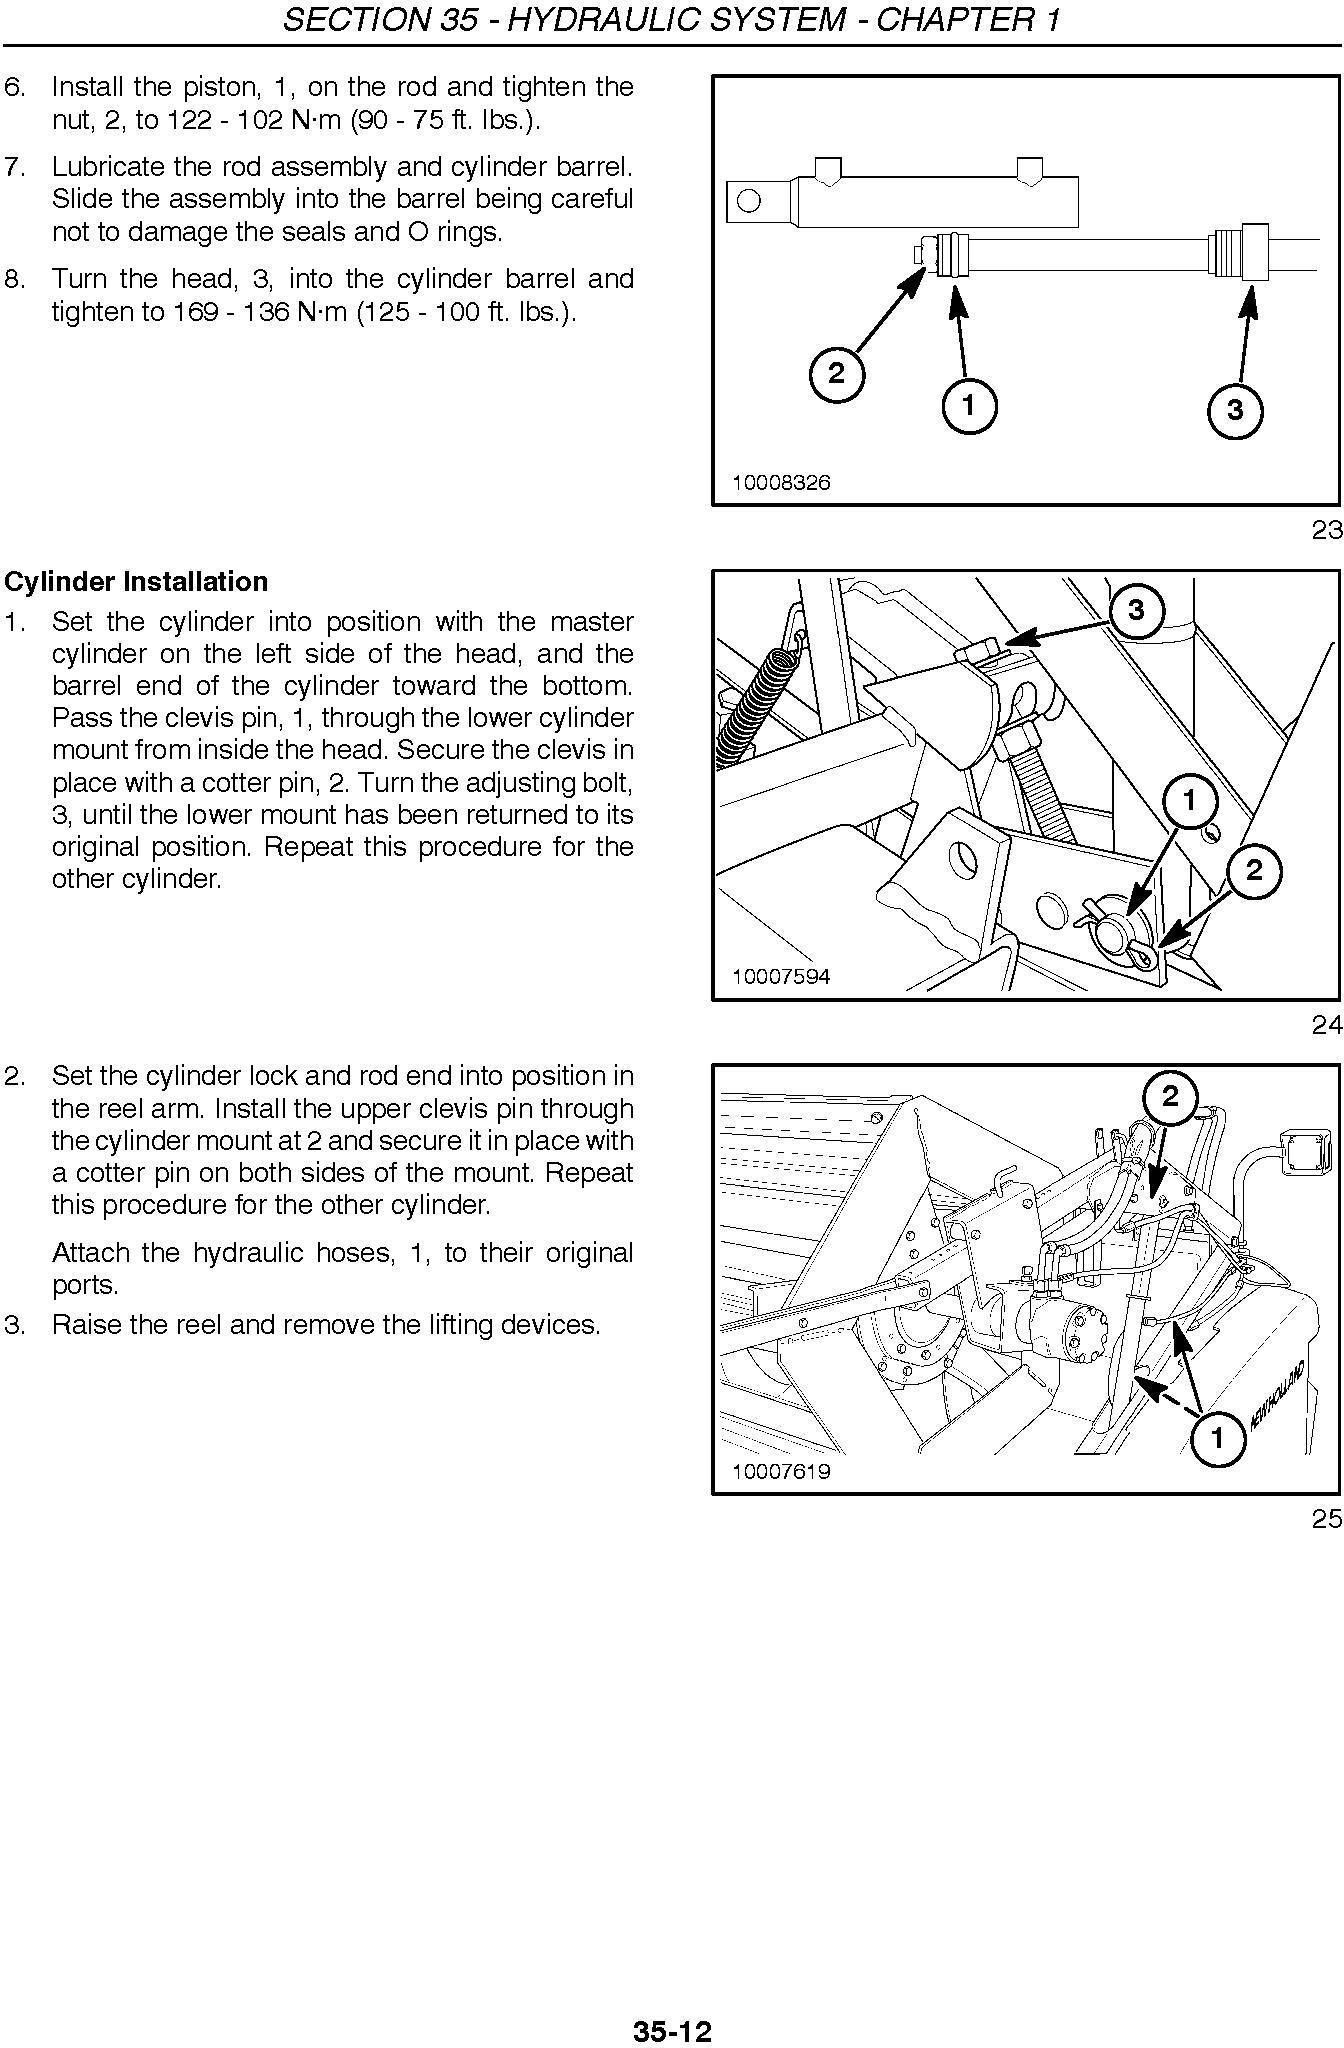 New Holland 72c, 74c Grain Head Service Manual - 2